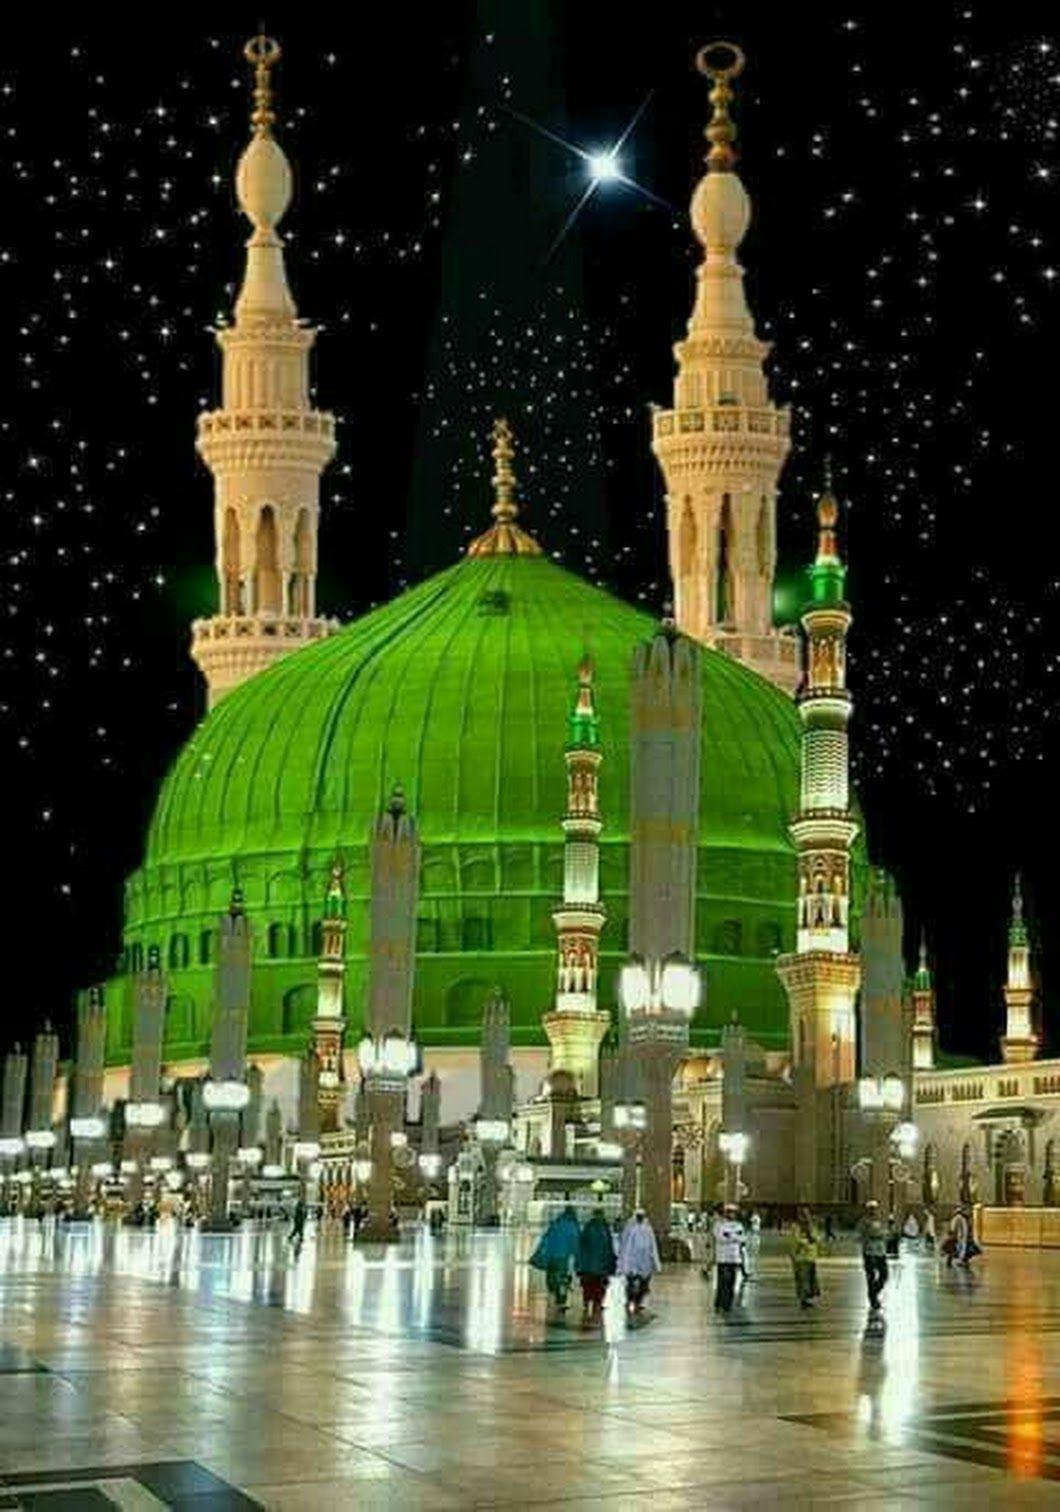 medina saudi arabia cities around world at night pinterest